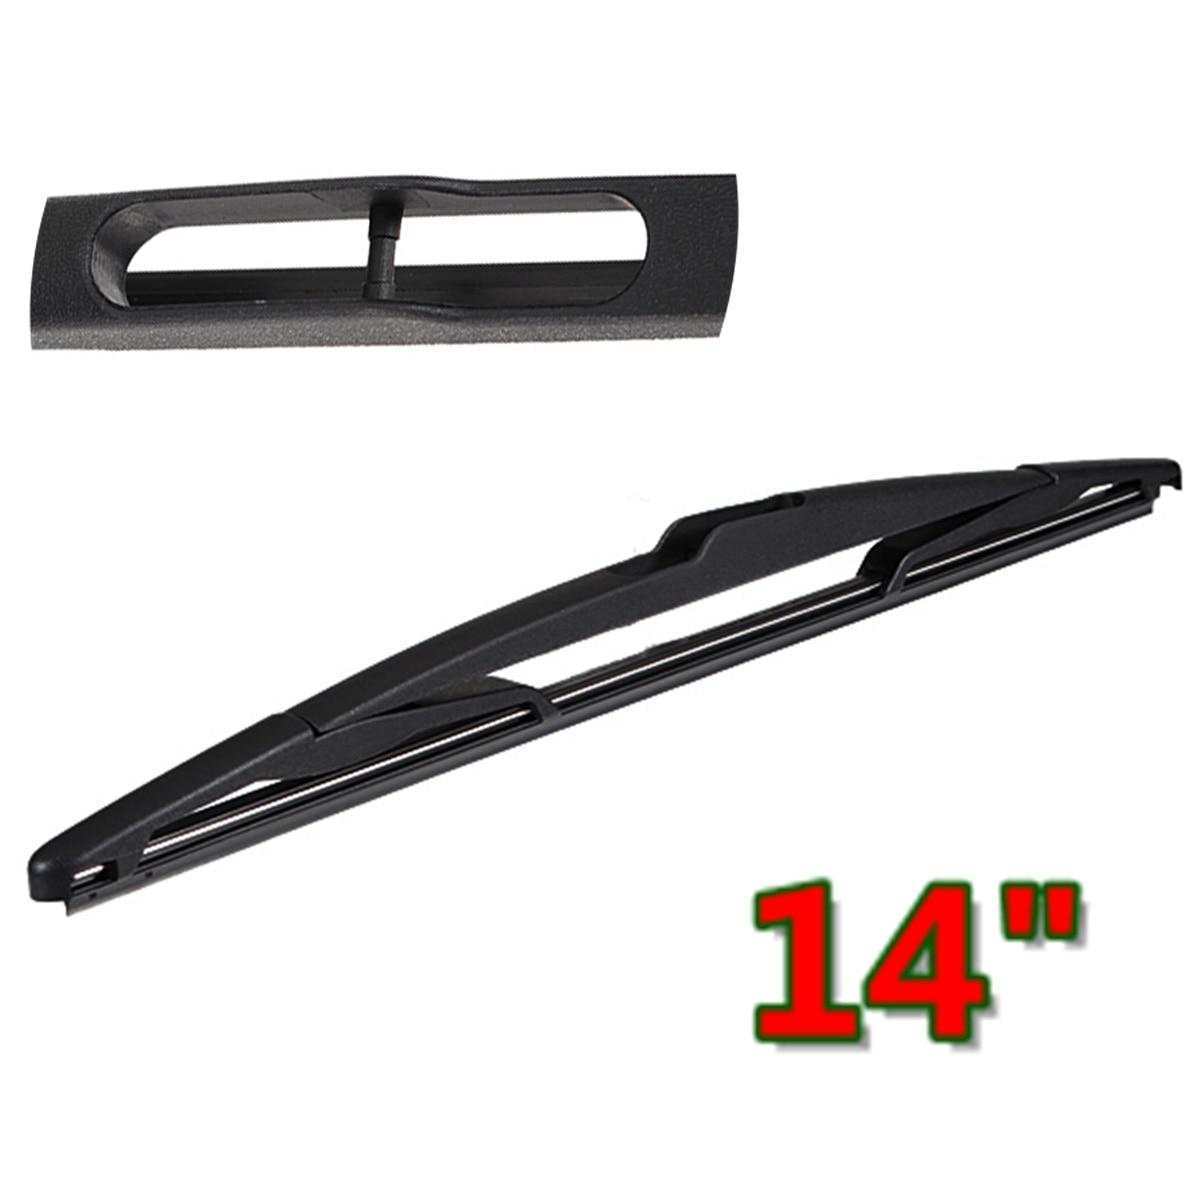 Peugeot Wiper Blades Reviews Online Shopping Peugeot